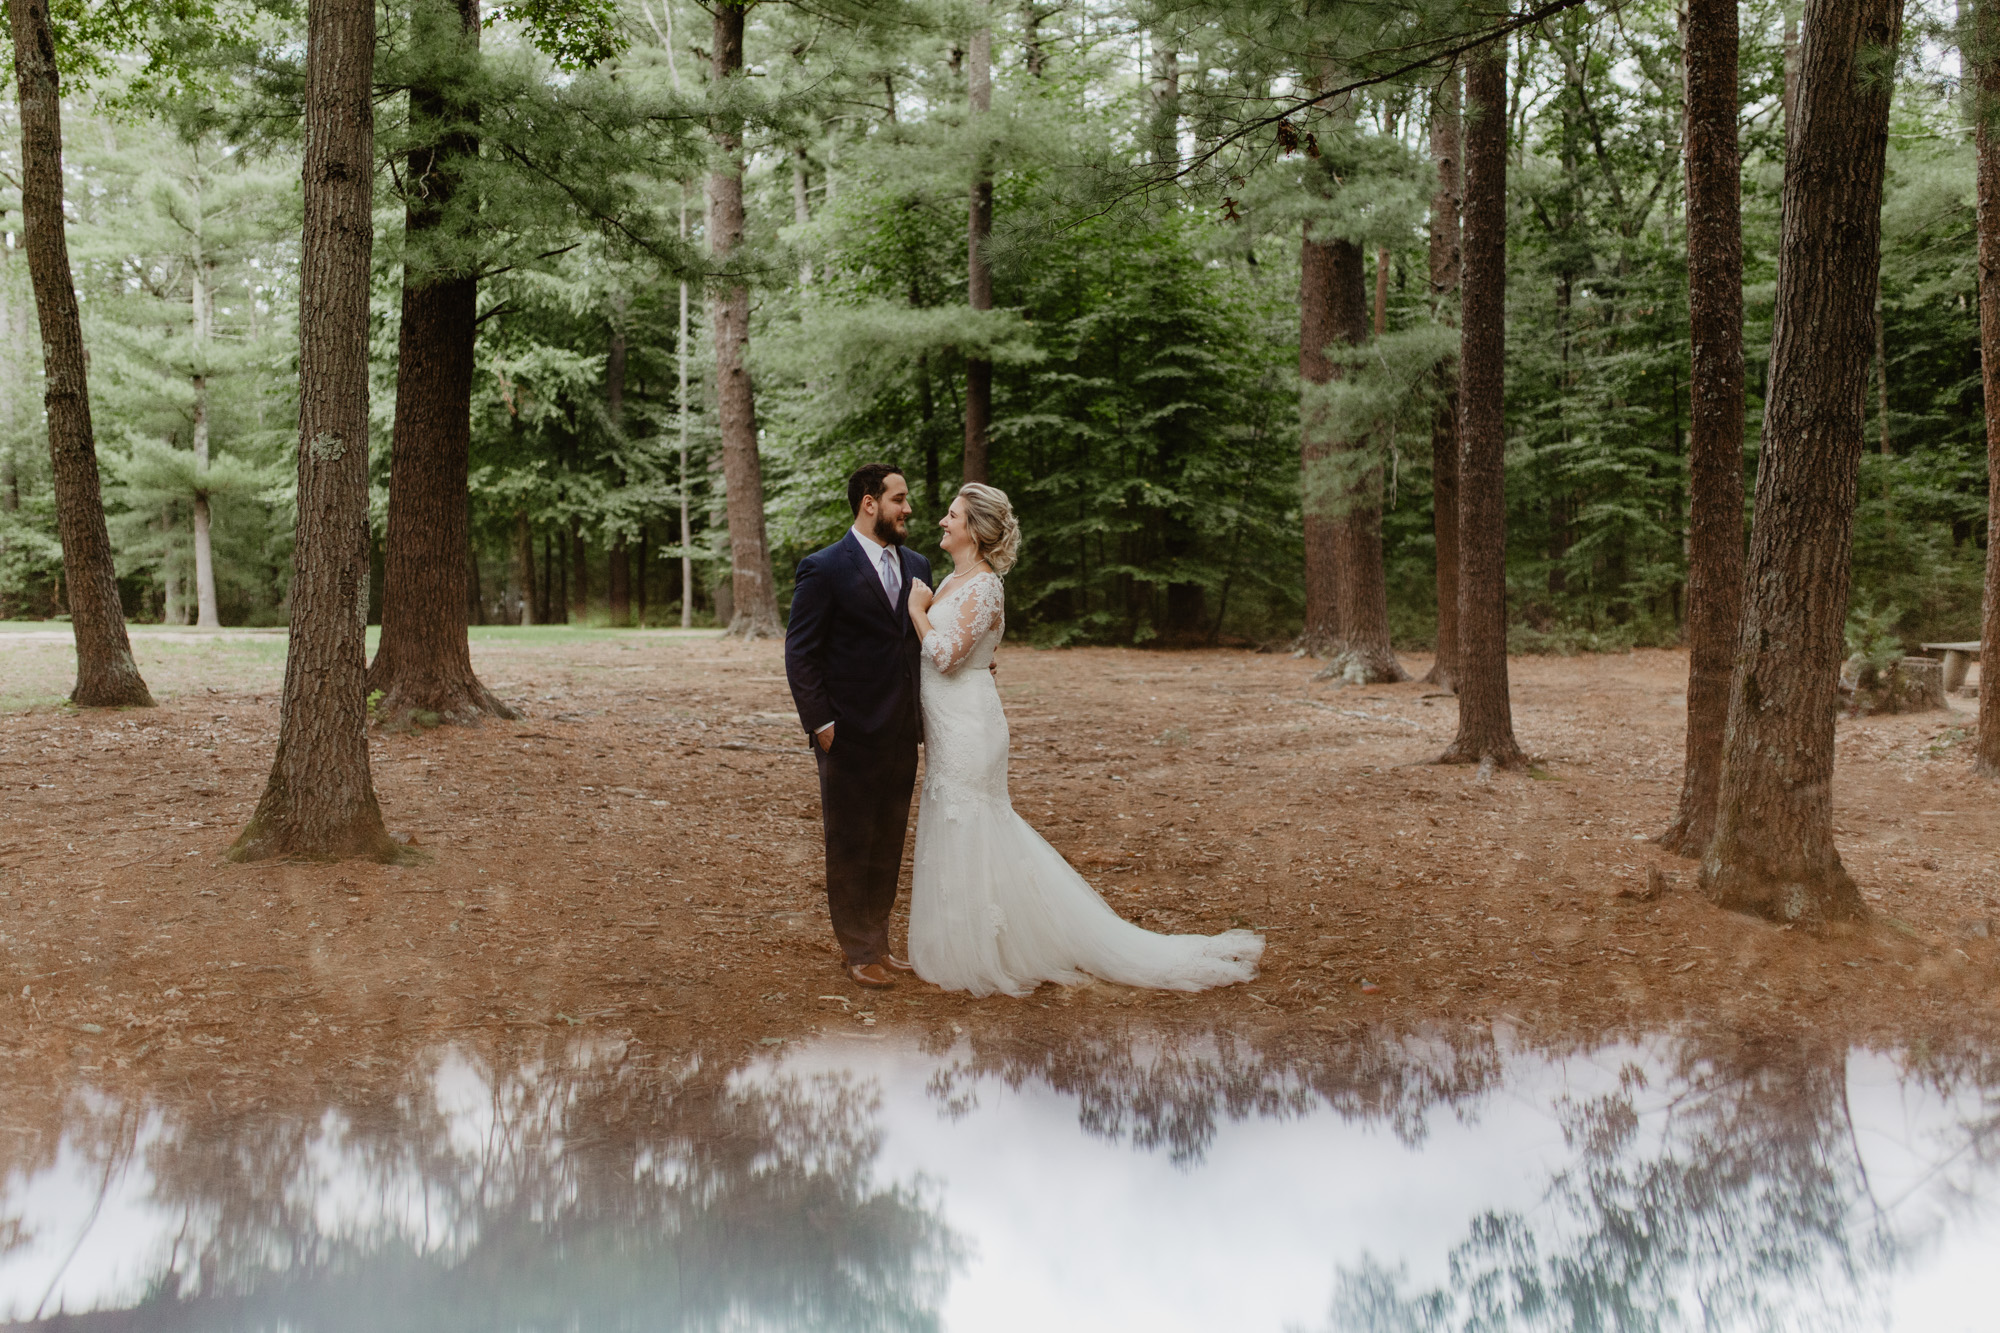 Wedding prism photography